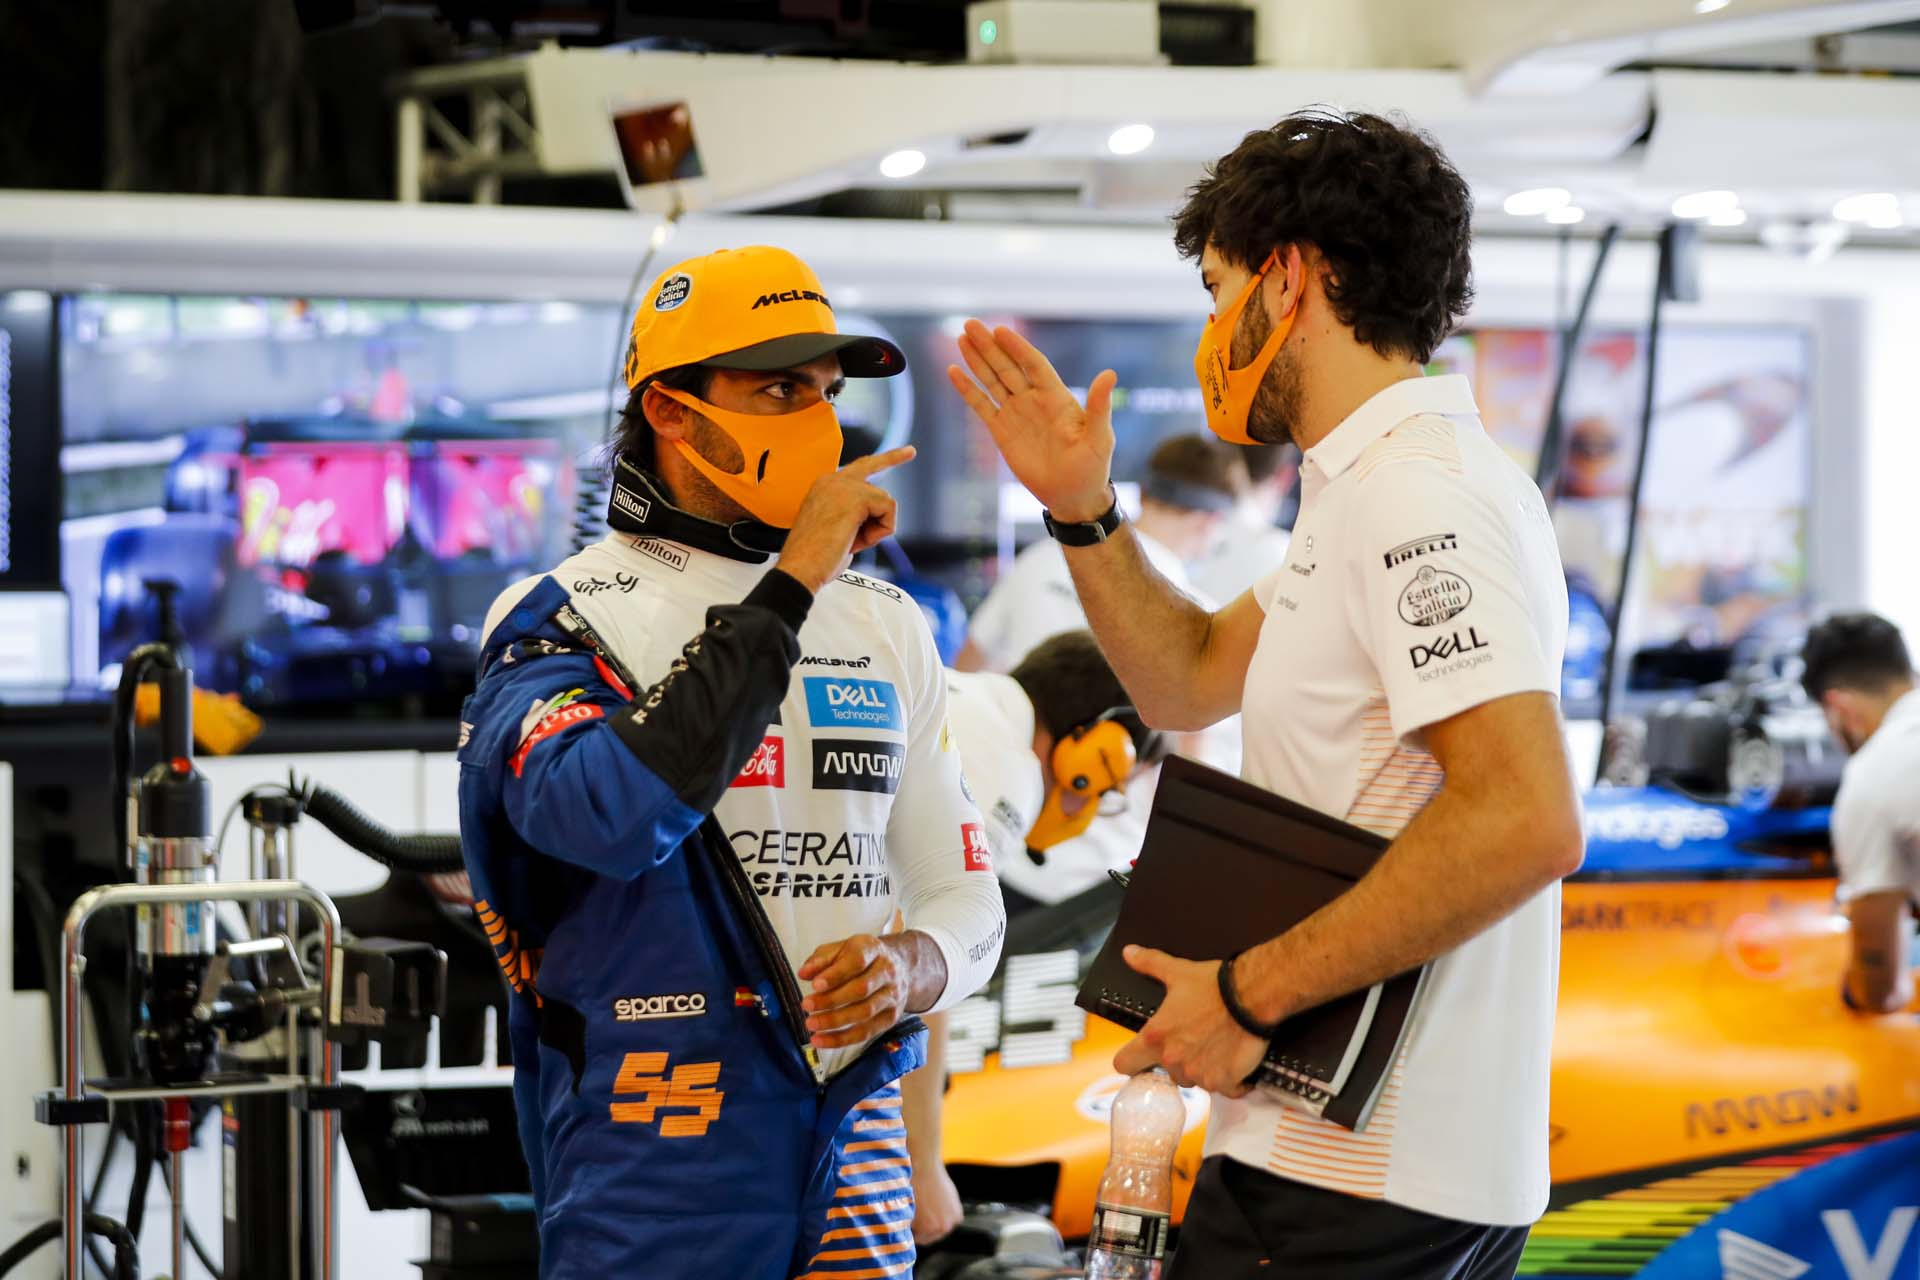 Carlos Sainz, McLaren, in the garage